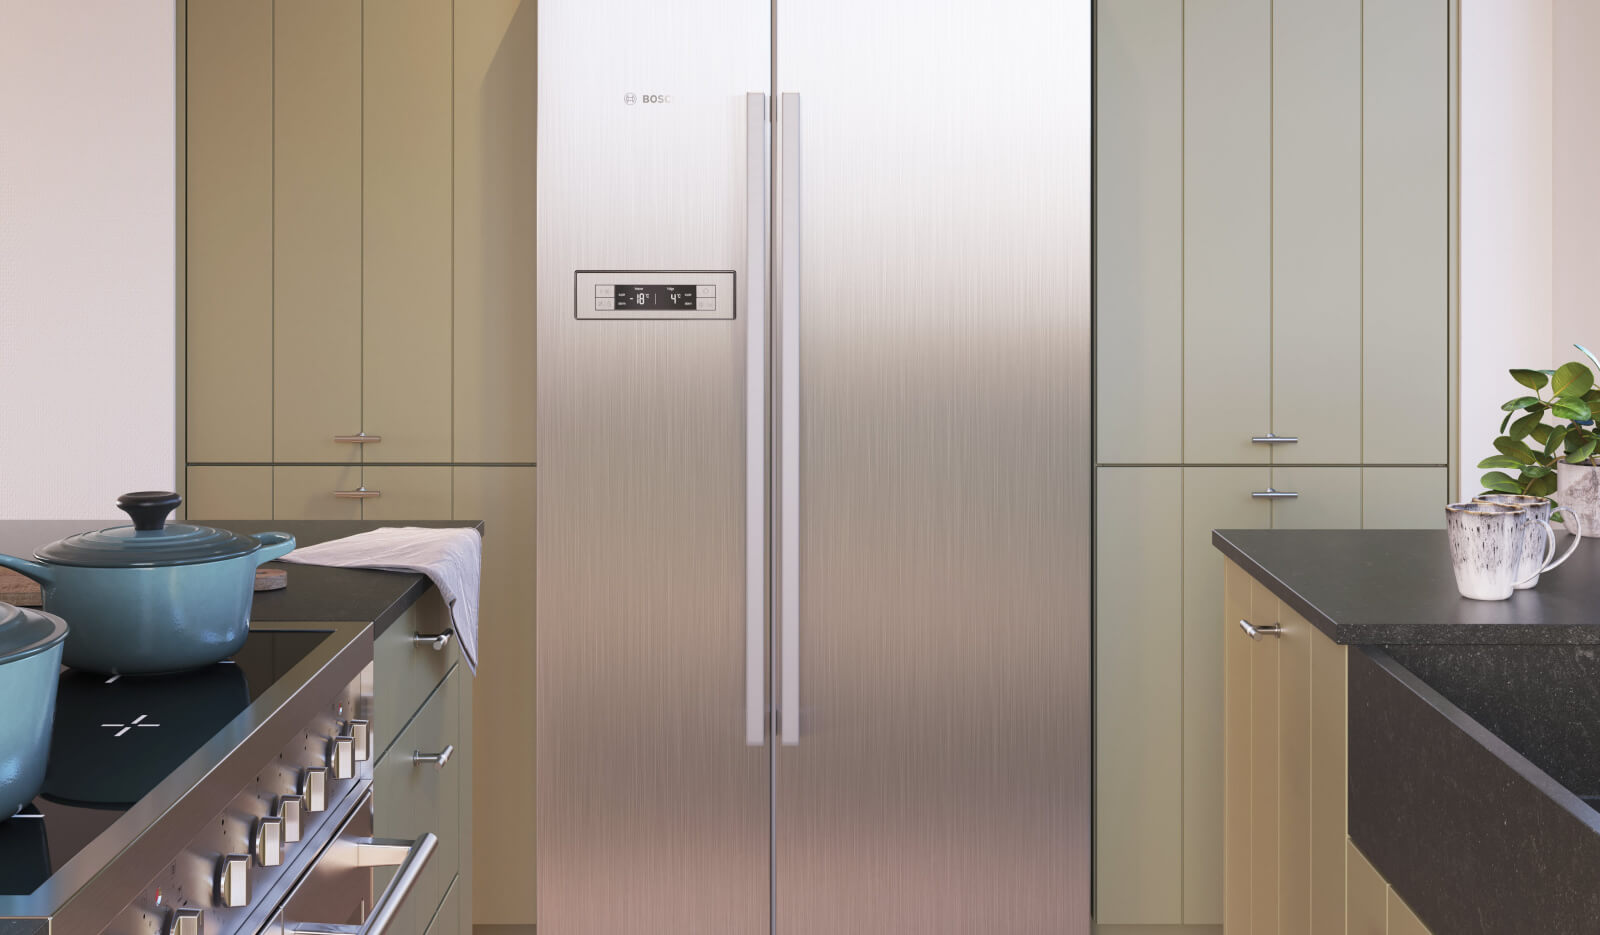 Keuken Olympia Stroken NCS olijfgroen - Amerikaanse koelkast